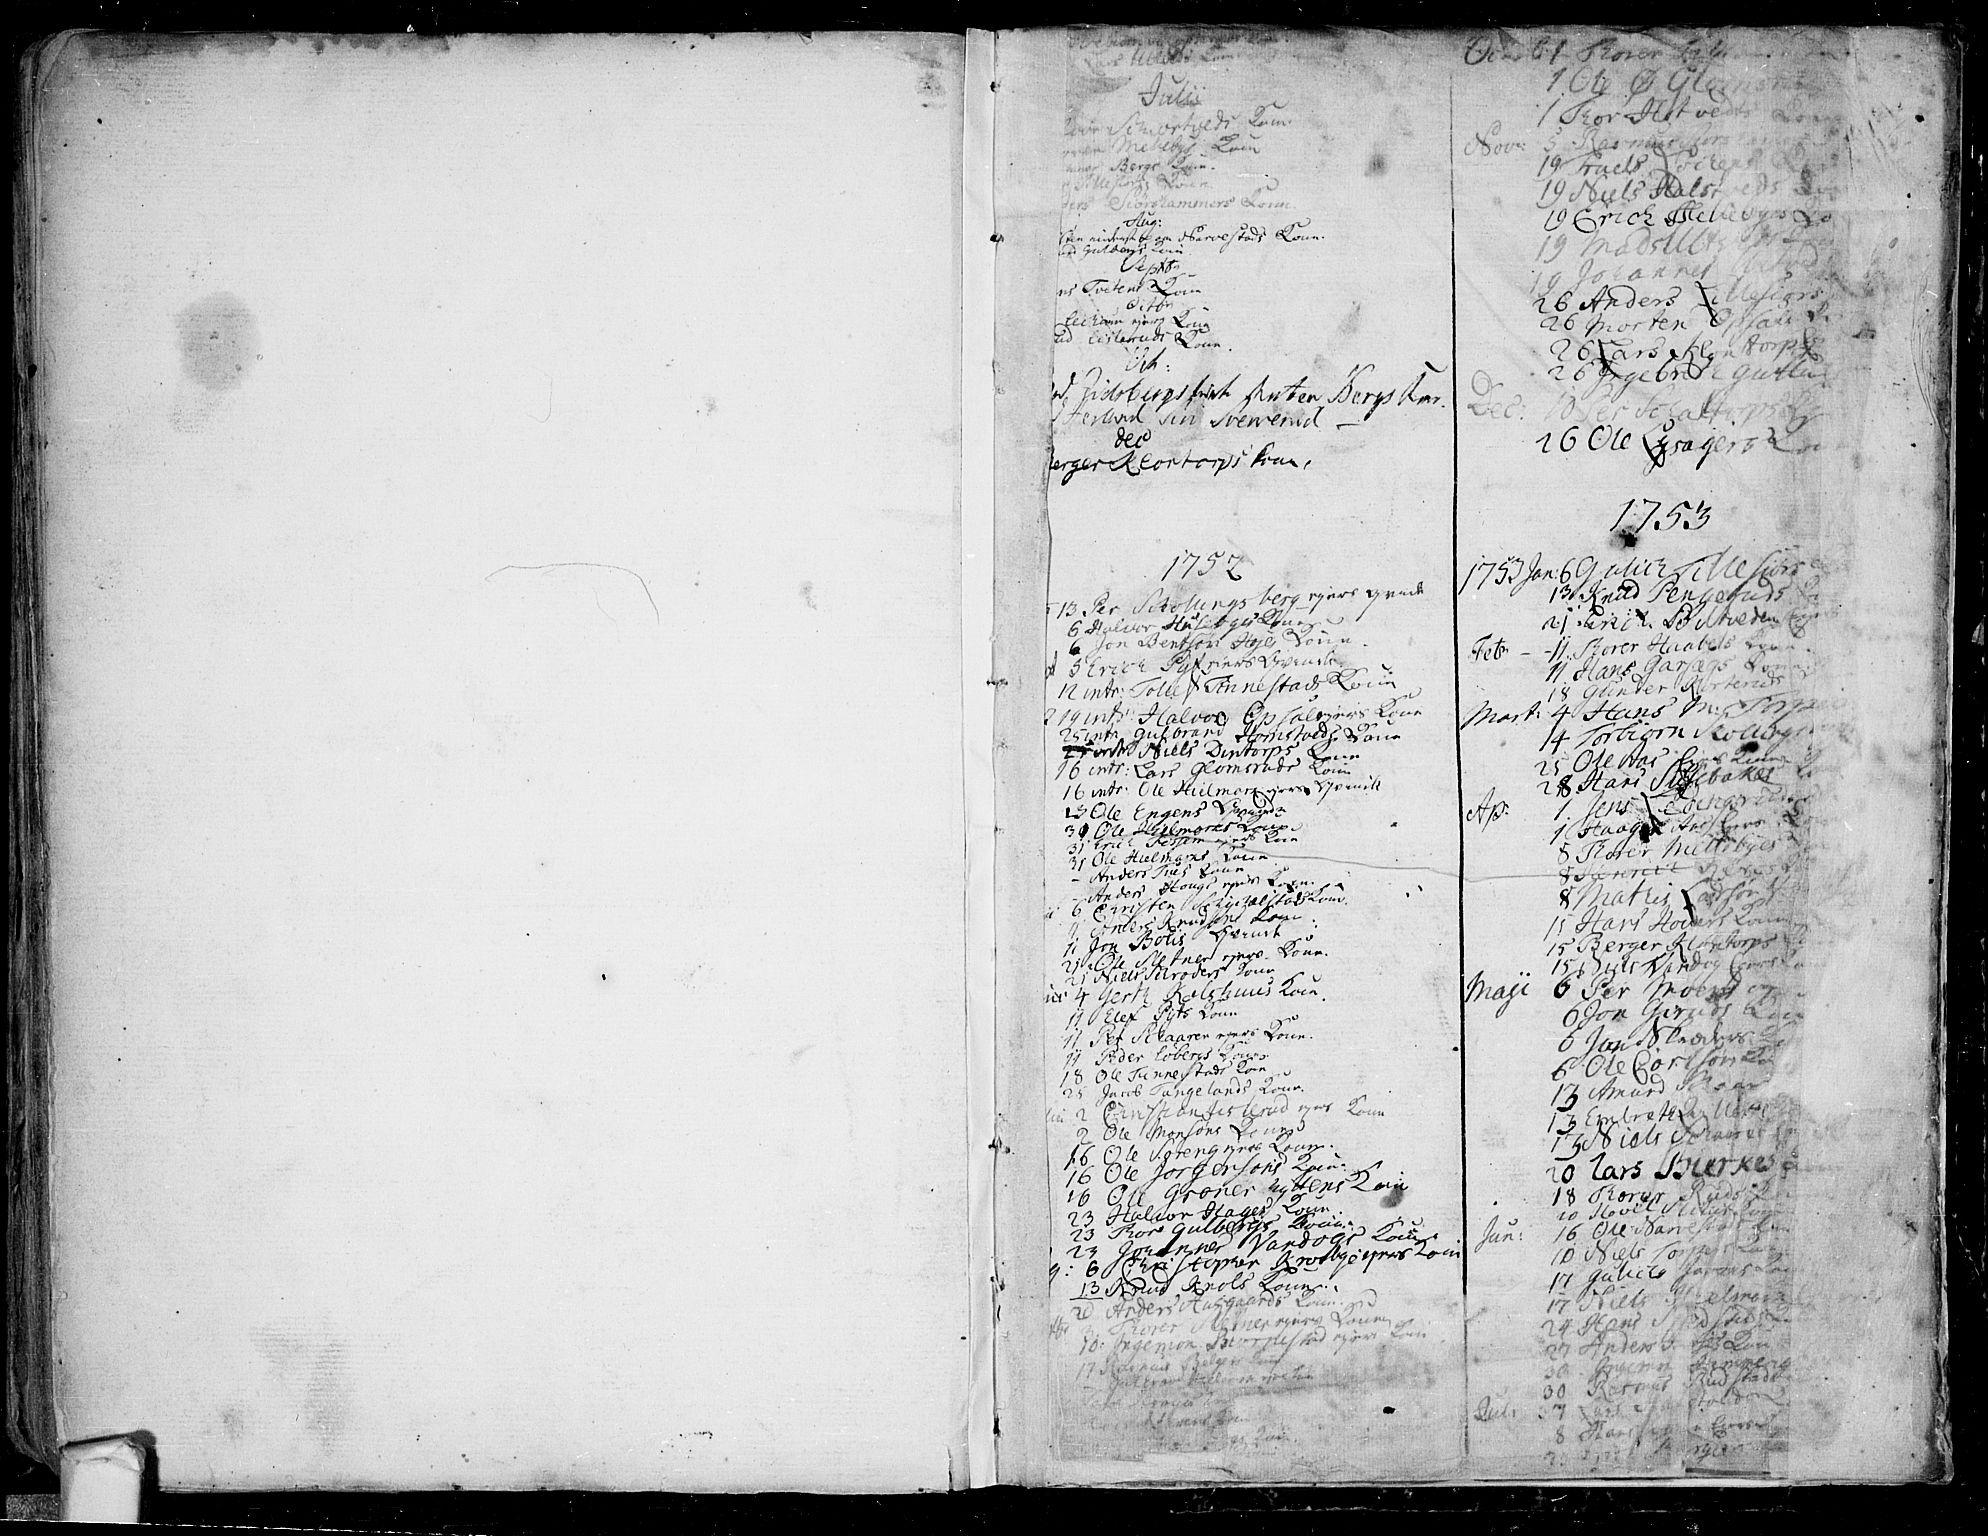 SAO, Eidsberg prestekontor Kirkebøker, F/Fa/L0003: Ministerialbok nr.  I 3, 1742-1758, s. 223-224